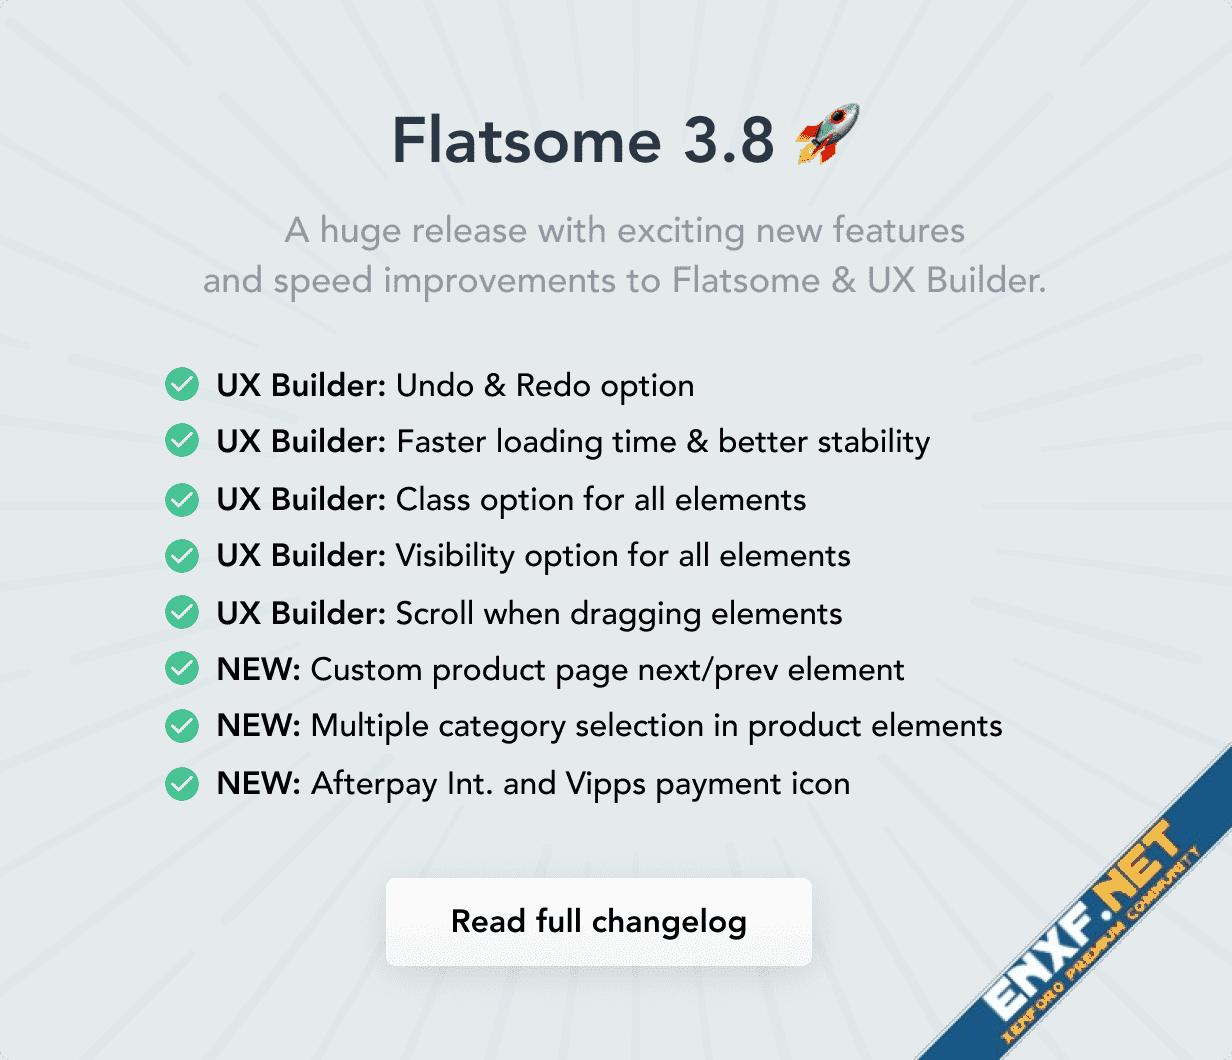 flatsome-3.8.png